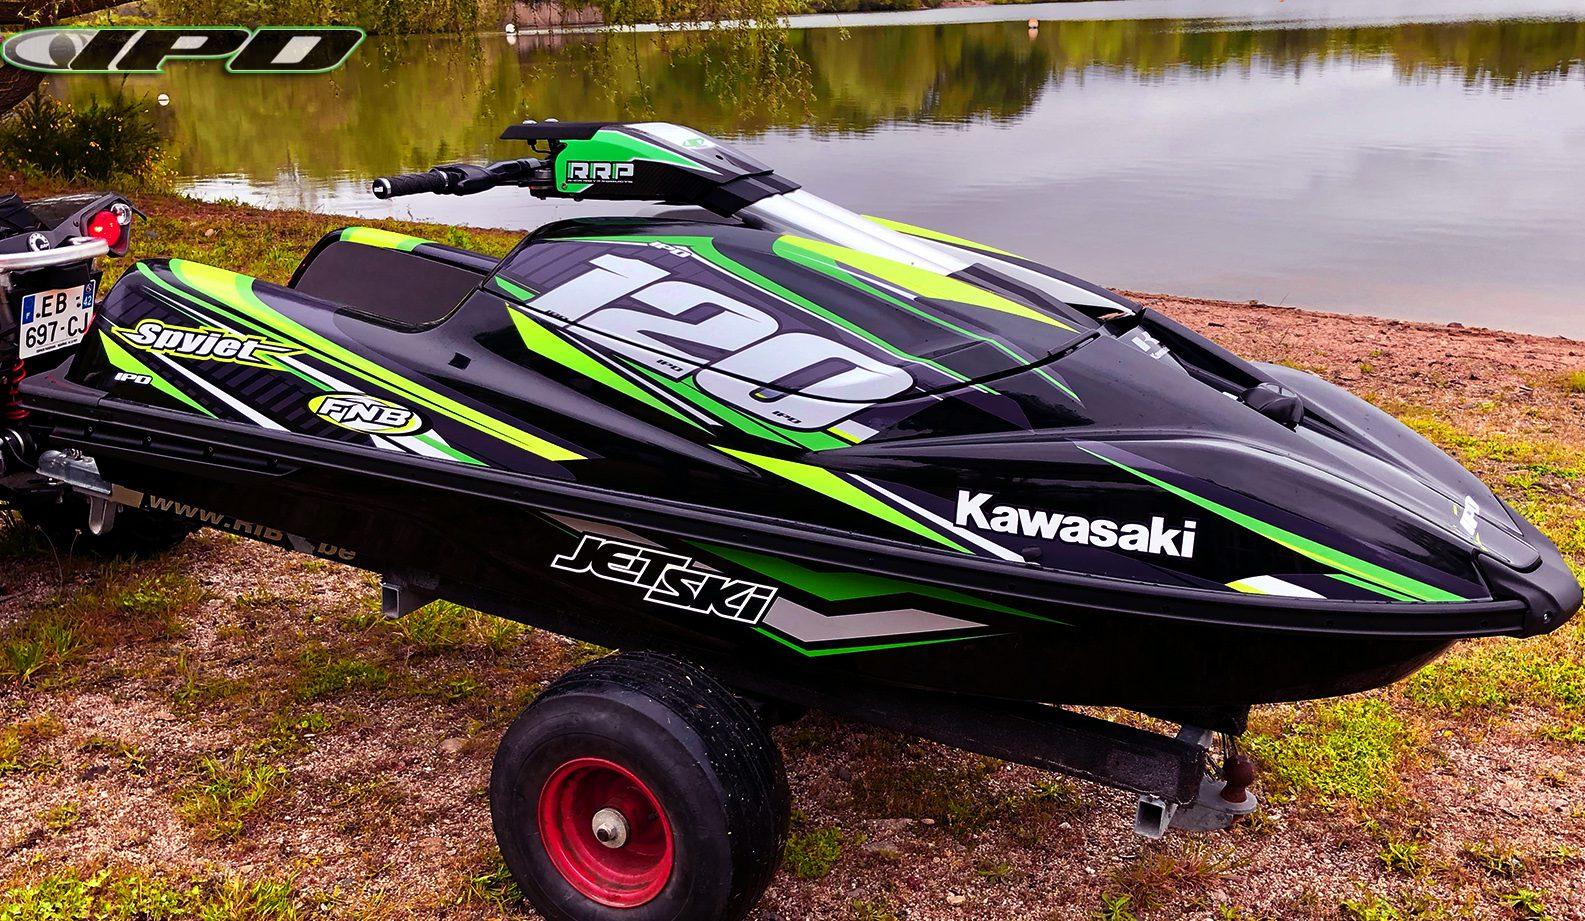 GK-BK-SXR4 installed on the Kawasaki SXR 1500